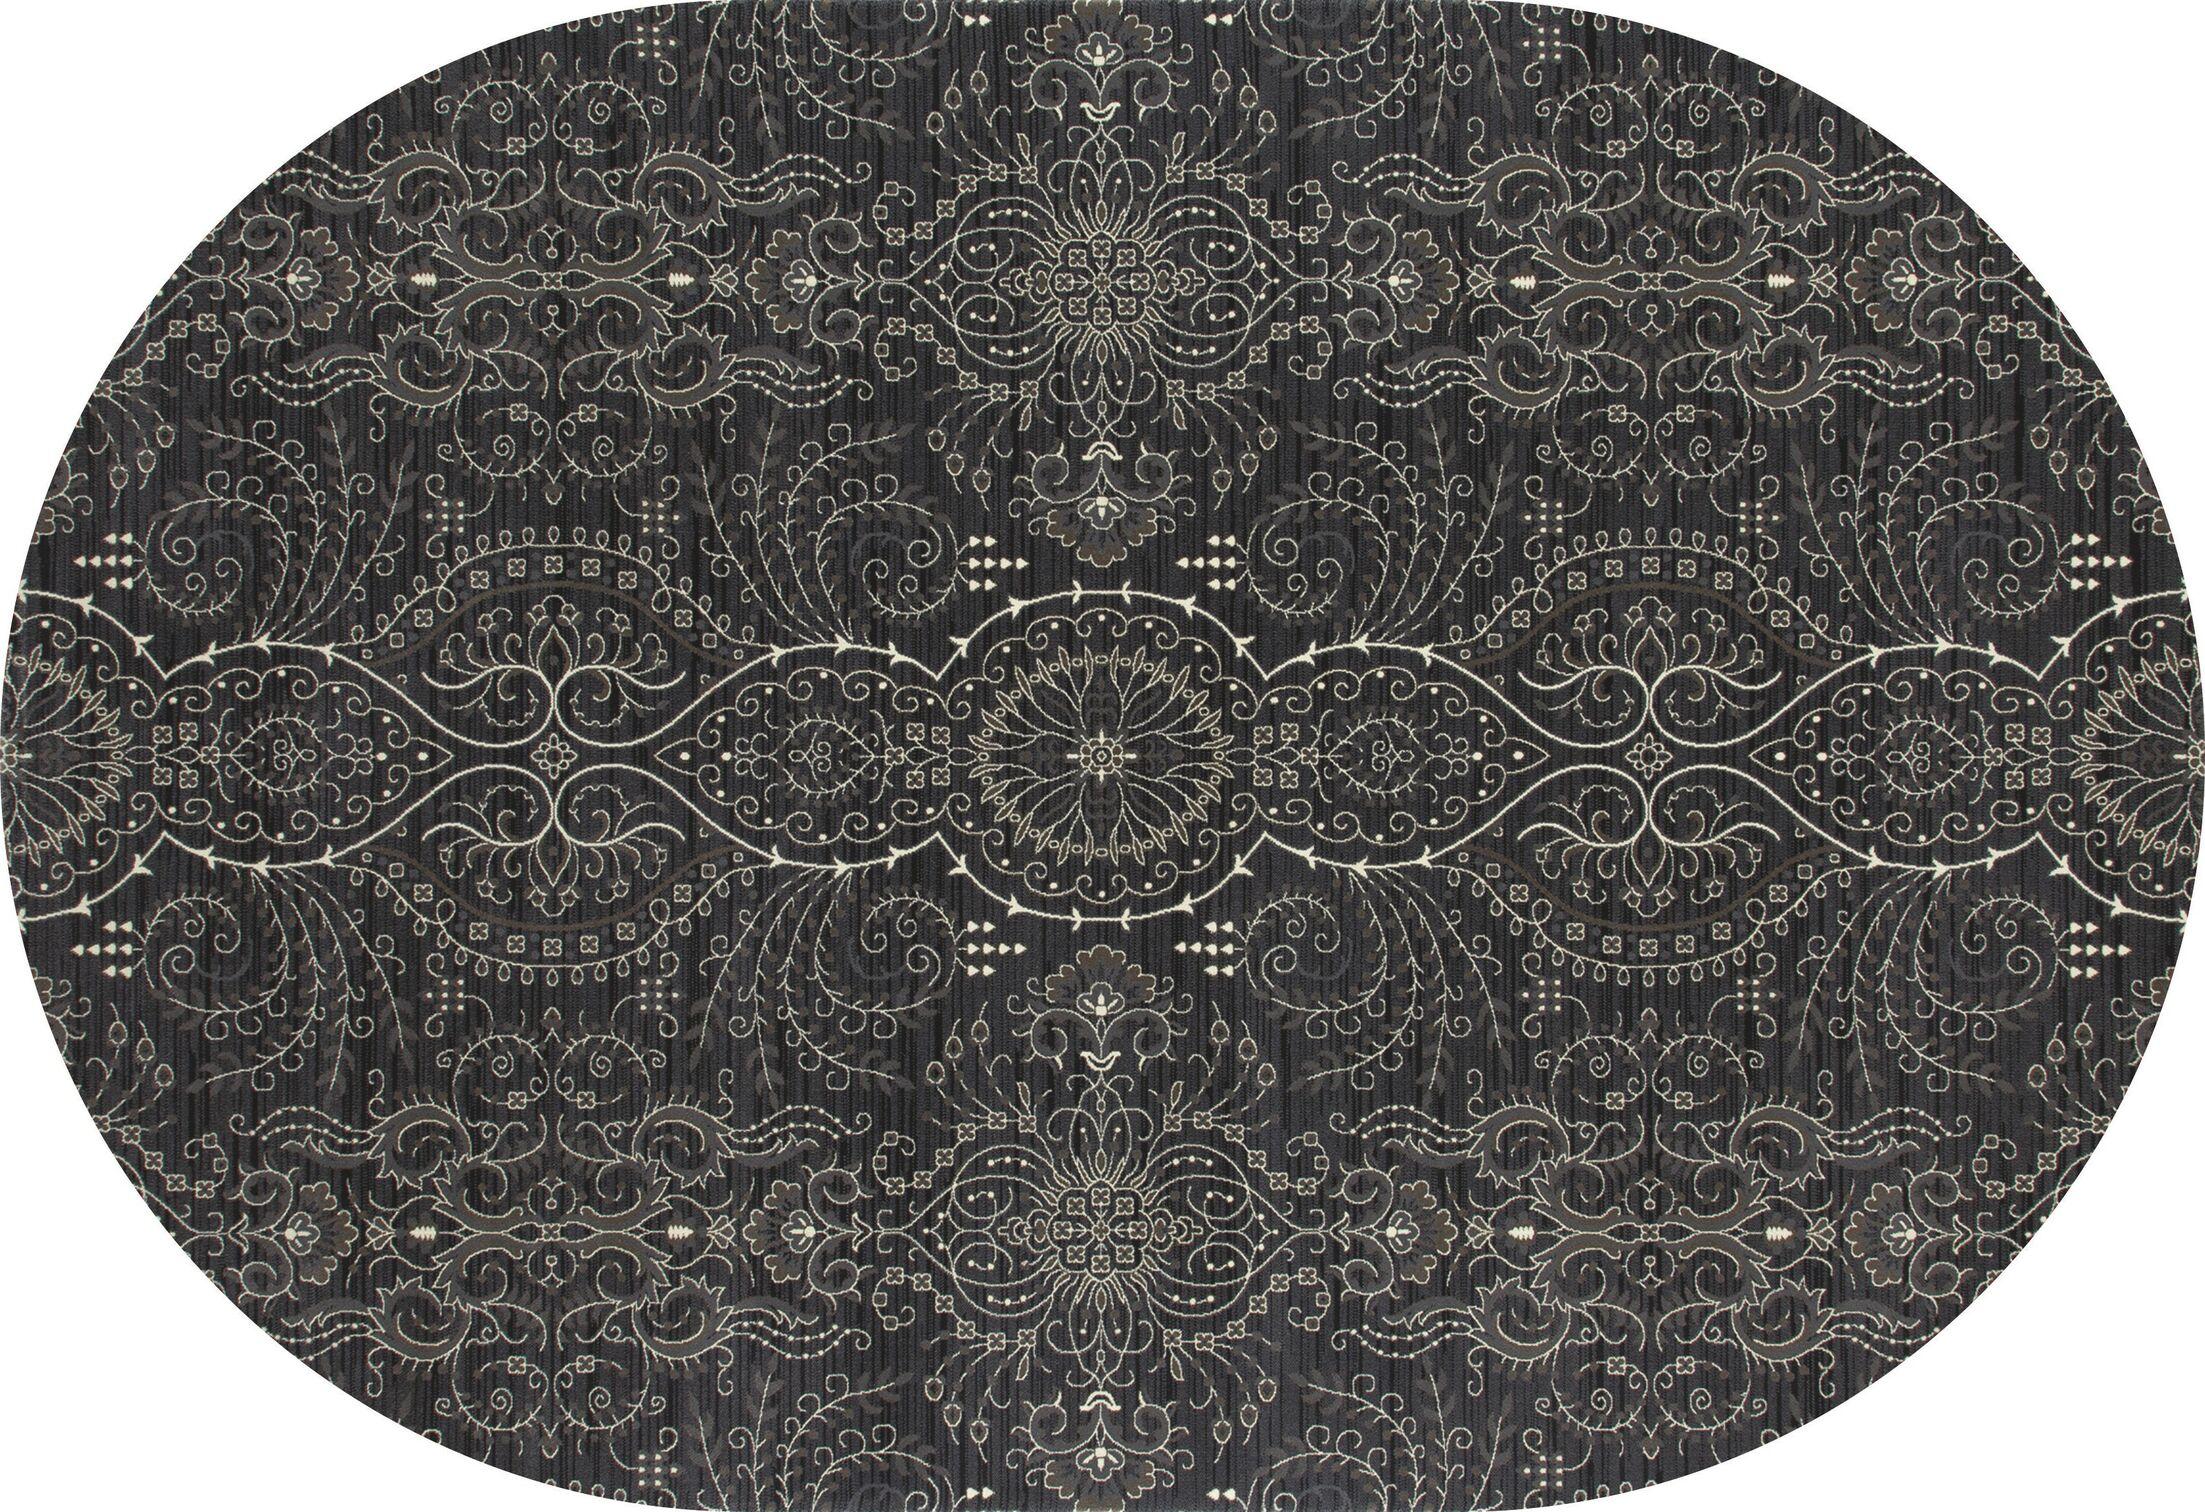 Castellano Gray Area Rug Rug Size: OVAL 6'7 x 9'10